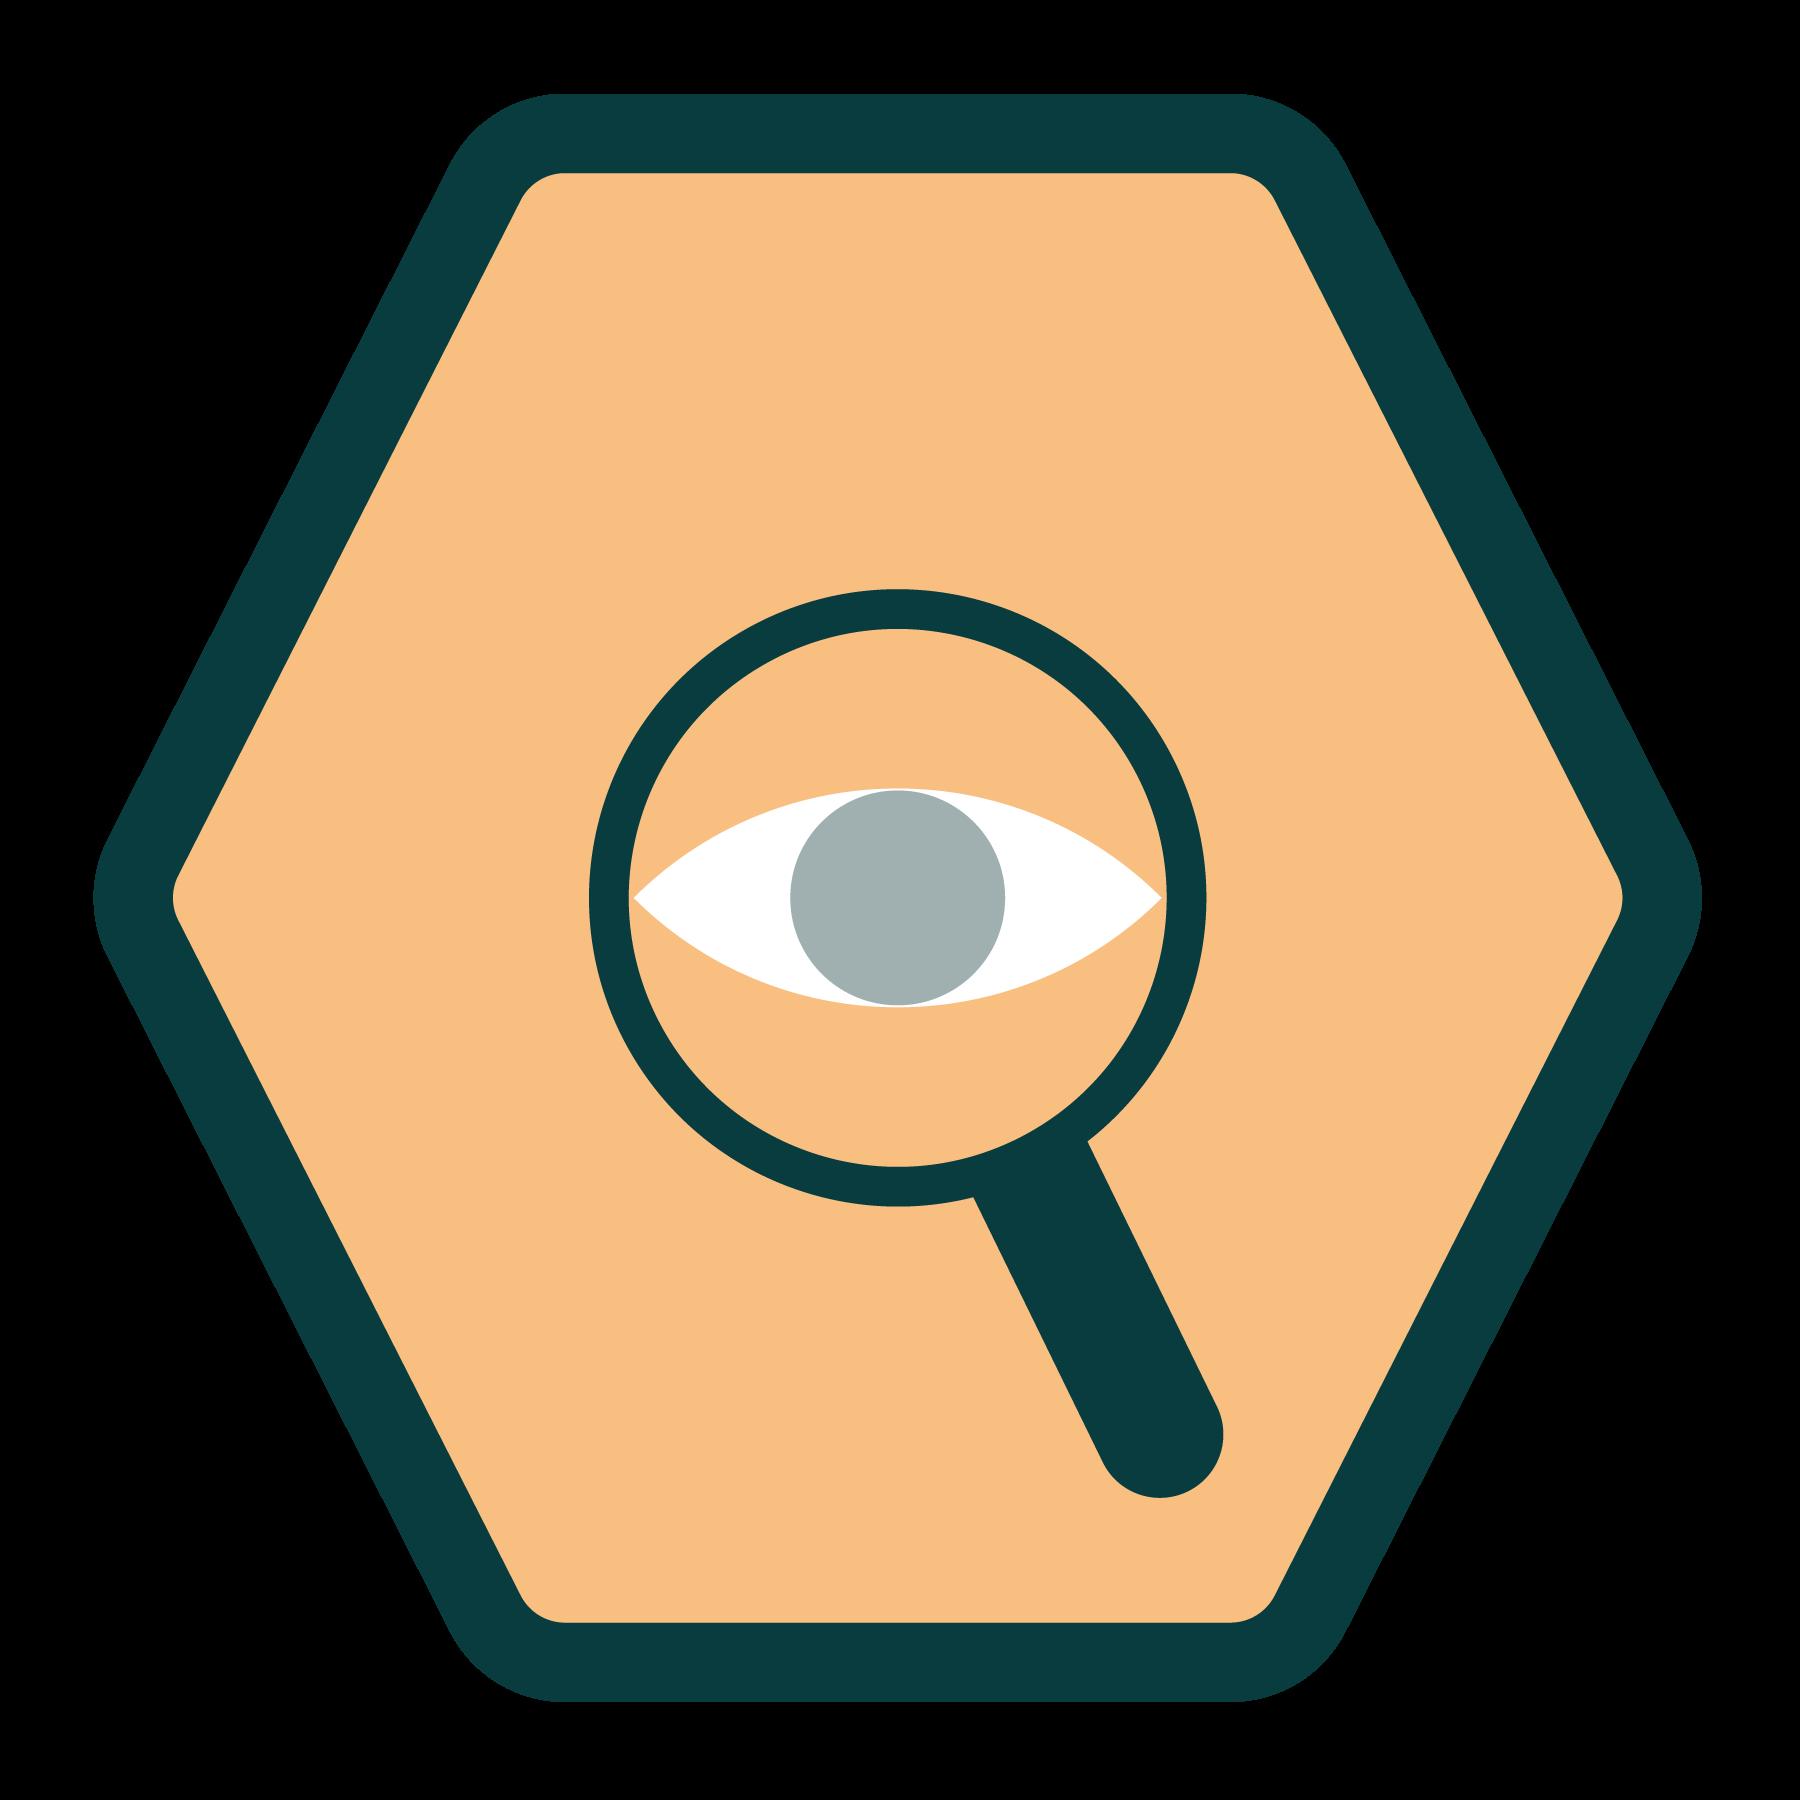 LFF009-MagnifyingGlass-Vector-Badge.png